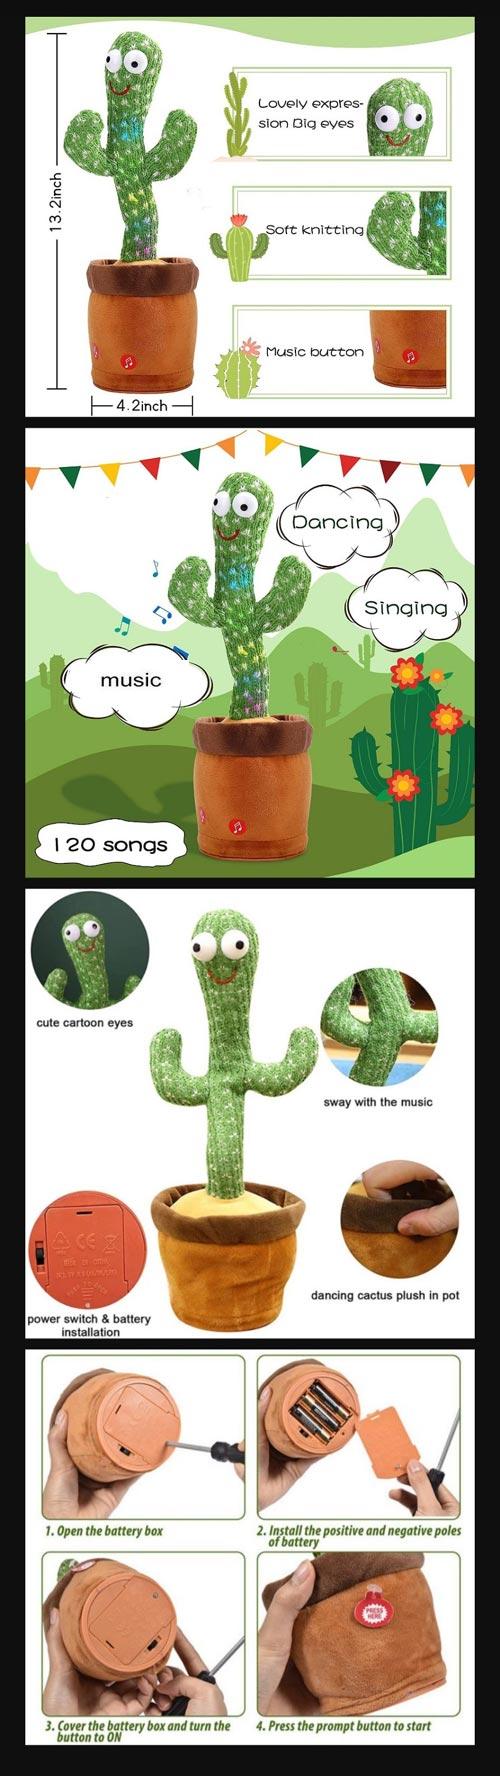 Dancing Cactus Toy In Pakistan